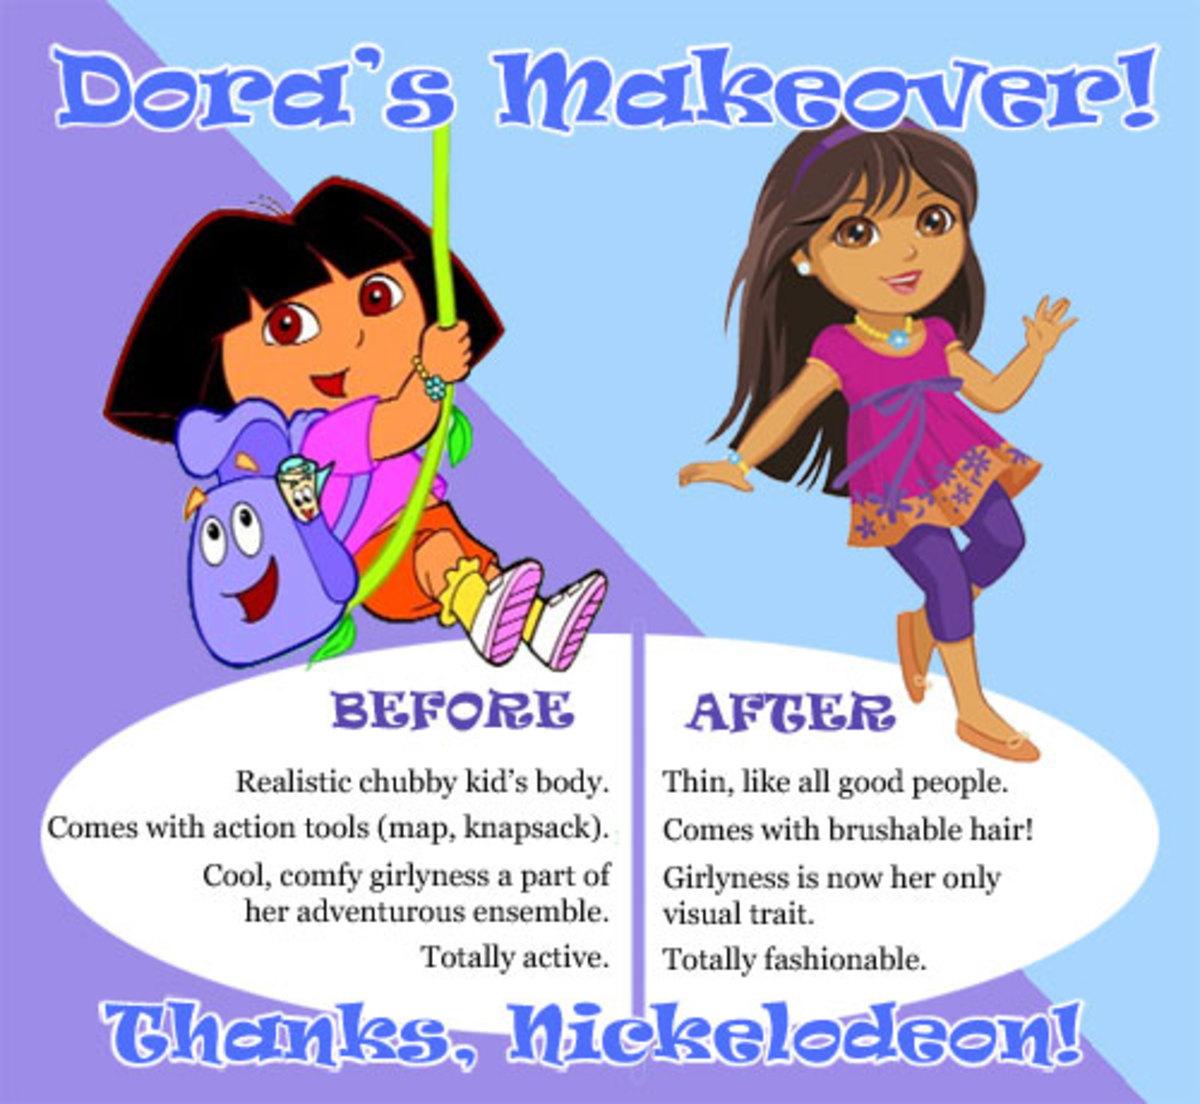 Kid Dora vs. Pre-teen Dora